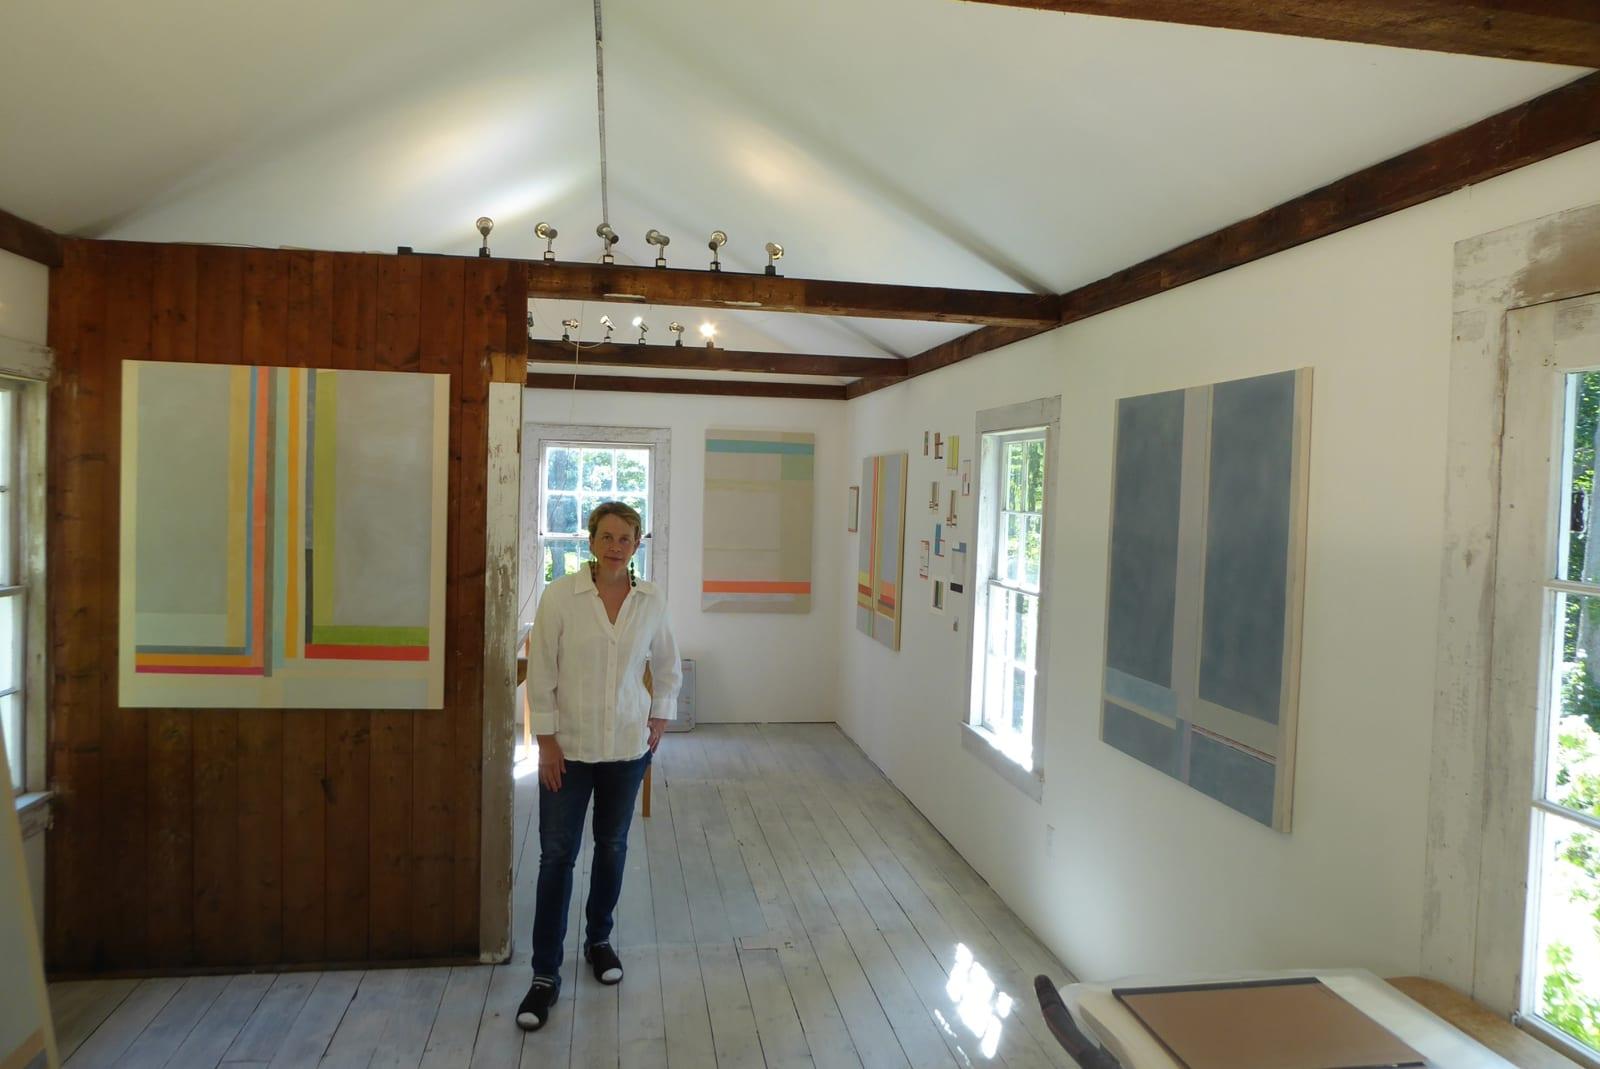 Elizabeth Gourlay in her studio, photo credit: Matthew Griffiths